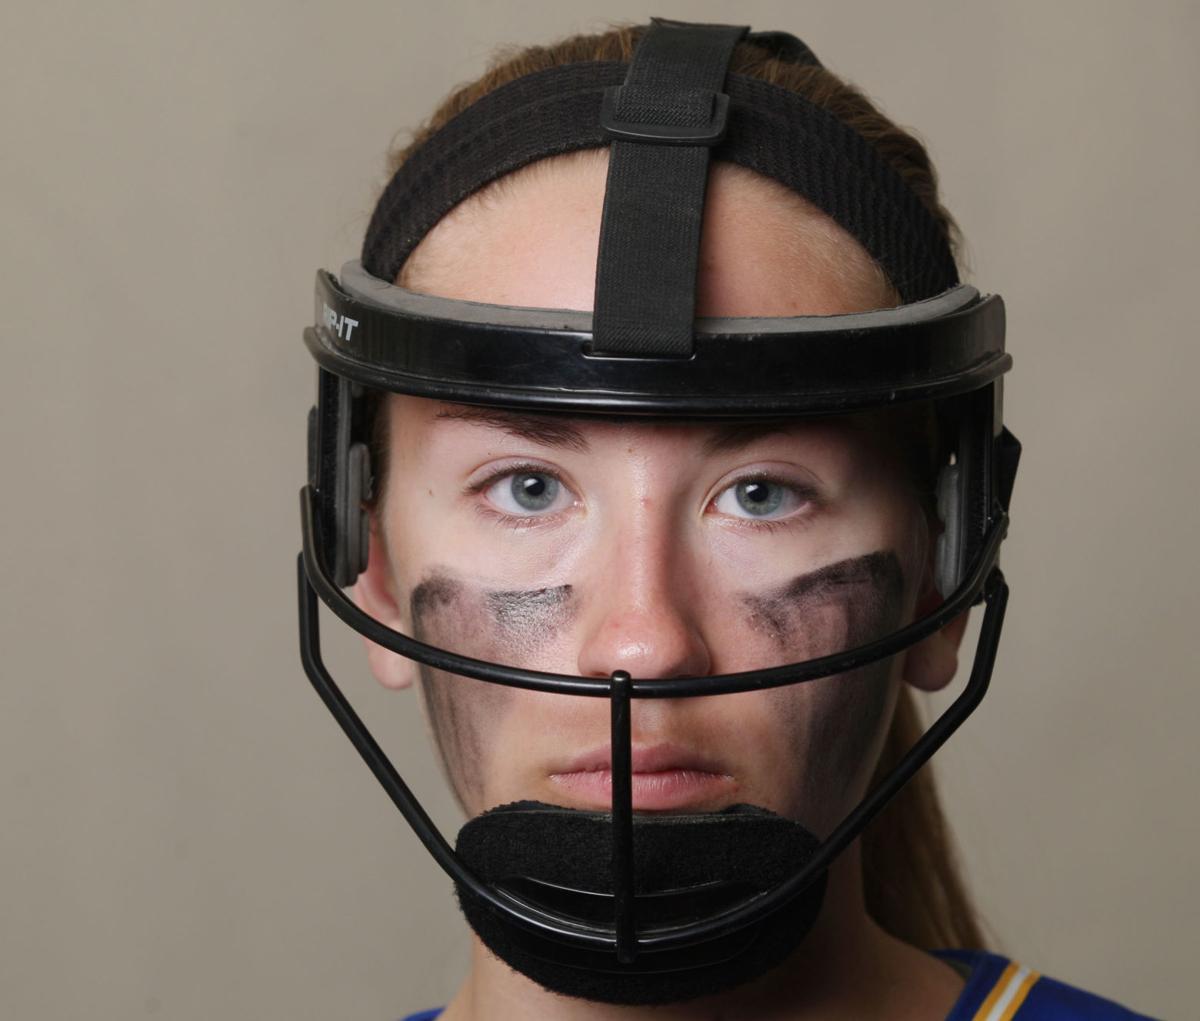 Softball mask for cutout